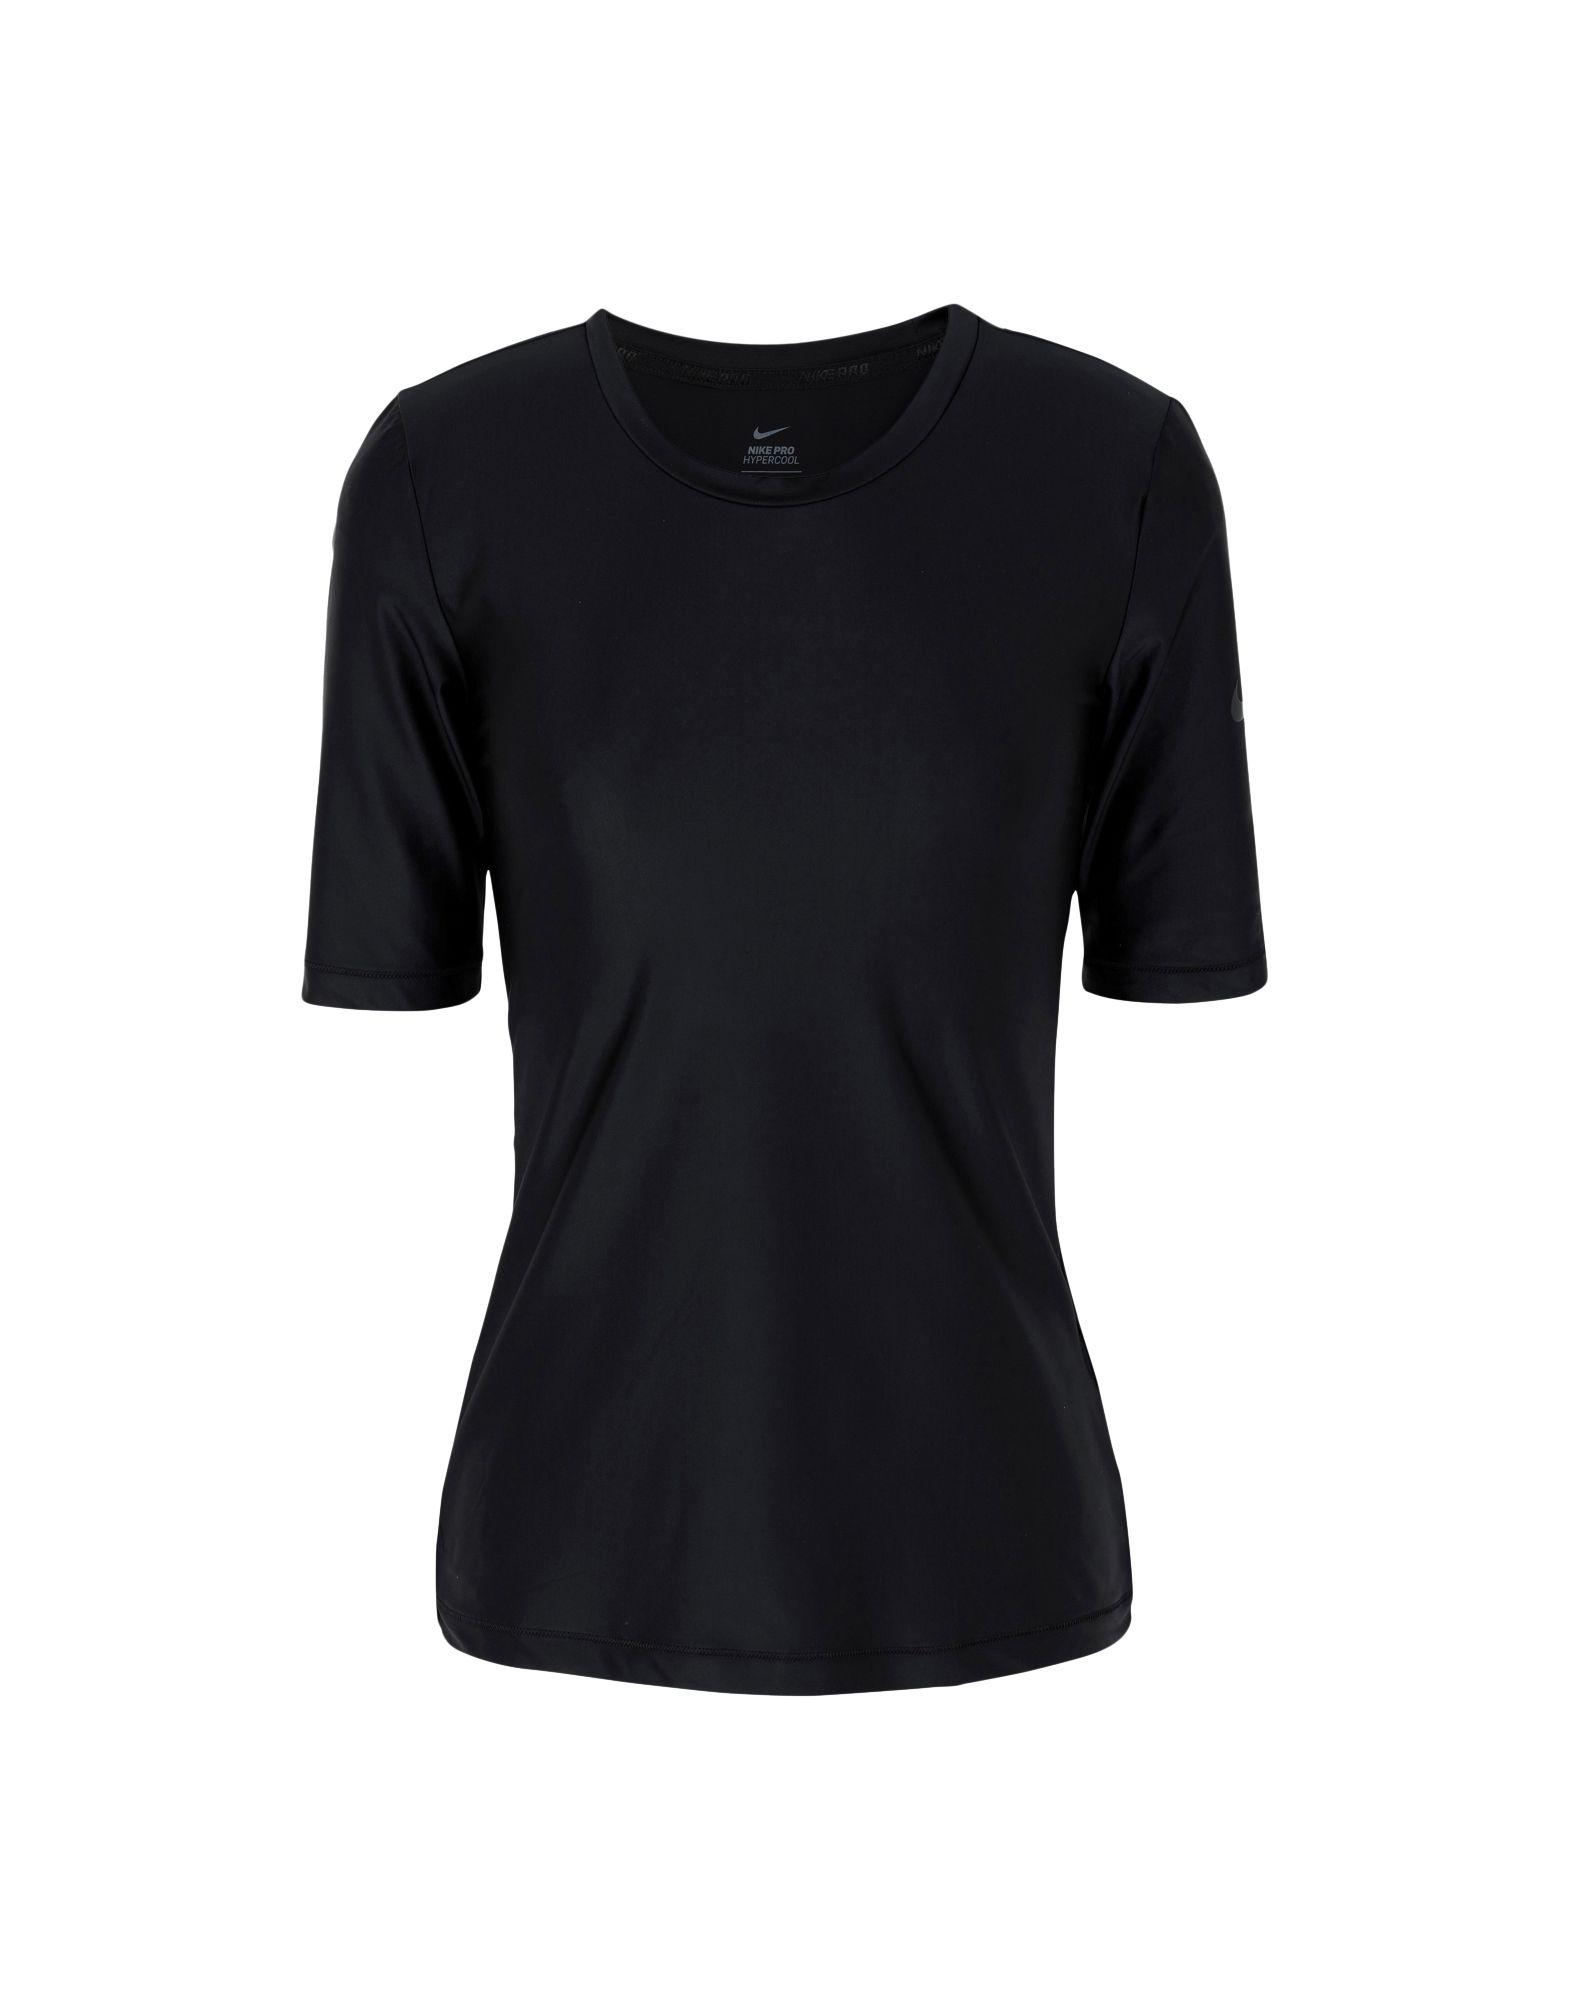 Bra Bra E Top Performance Nike  Hypercool Top Short Sleeves Glamour - donna - 12236267FR  beeilte sich zu sehen